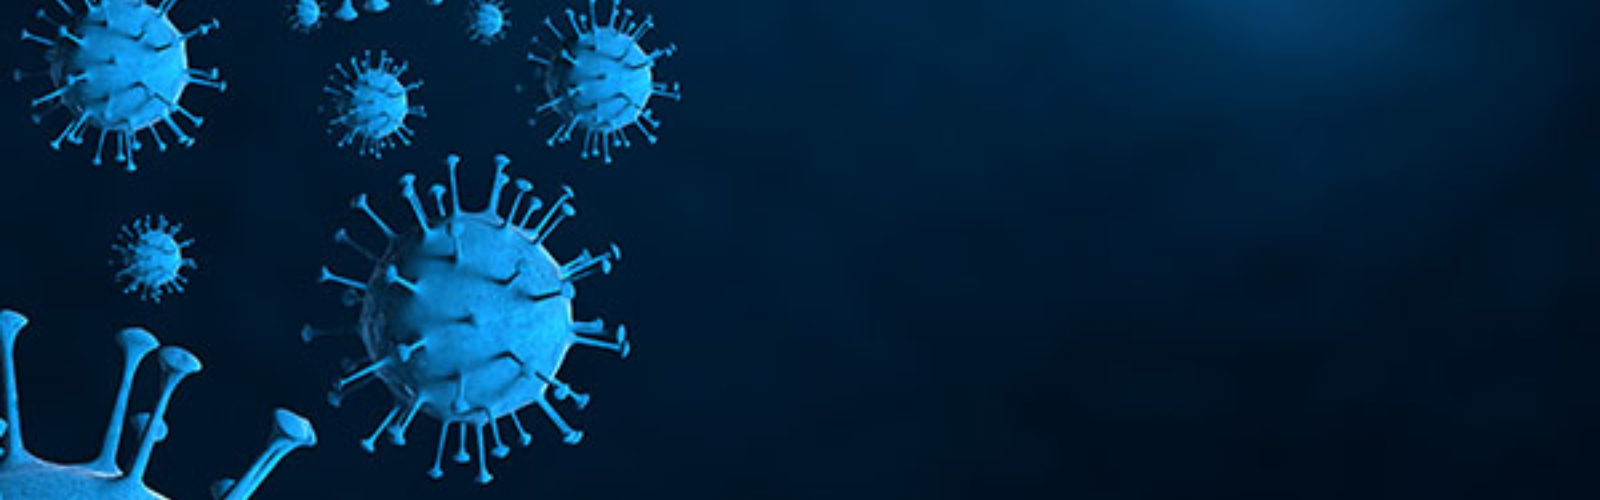 Blue virus (bs361284631)_web .jpg 1